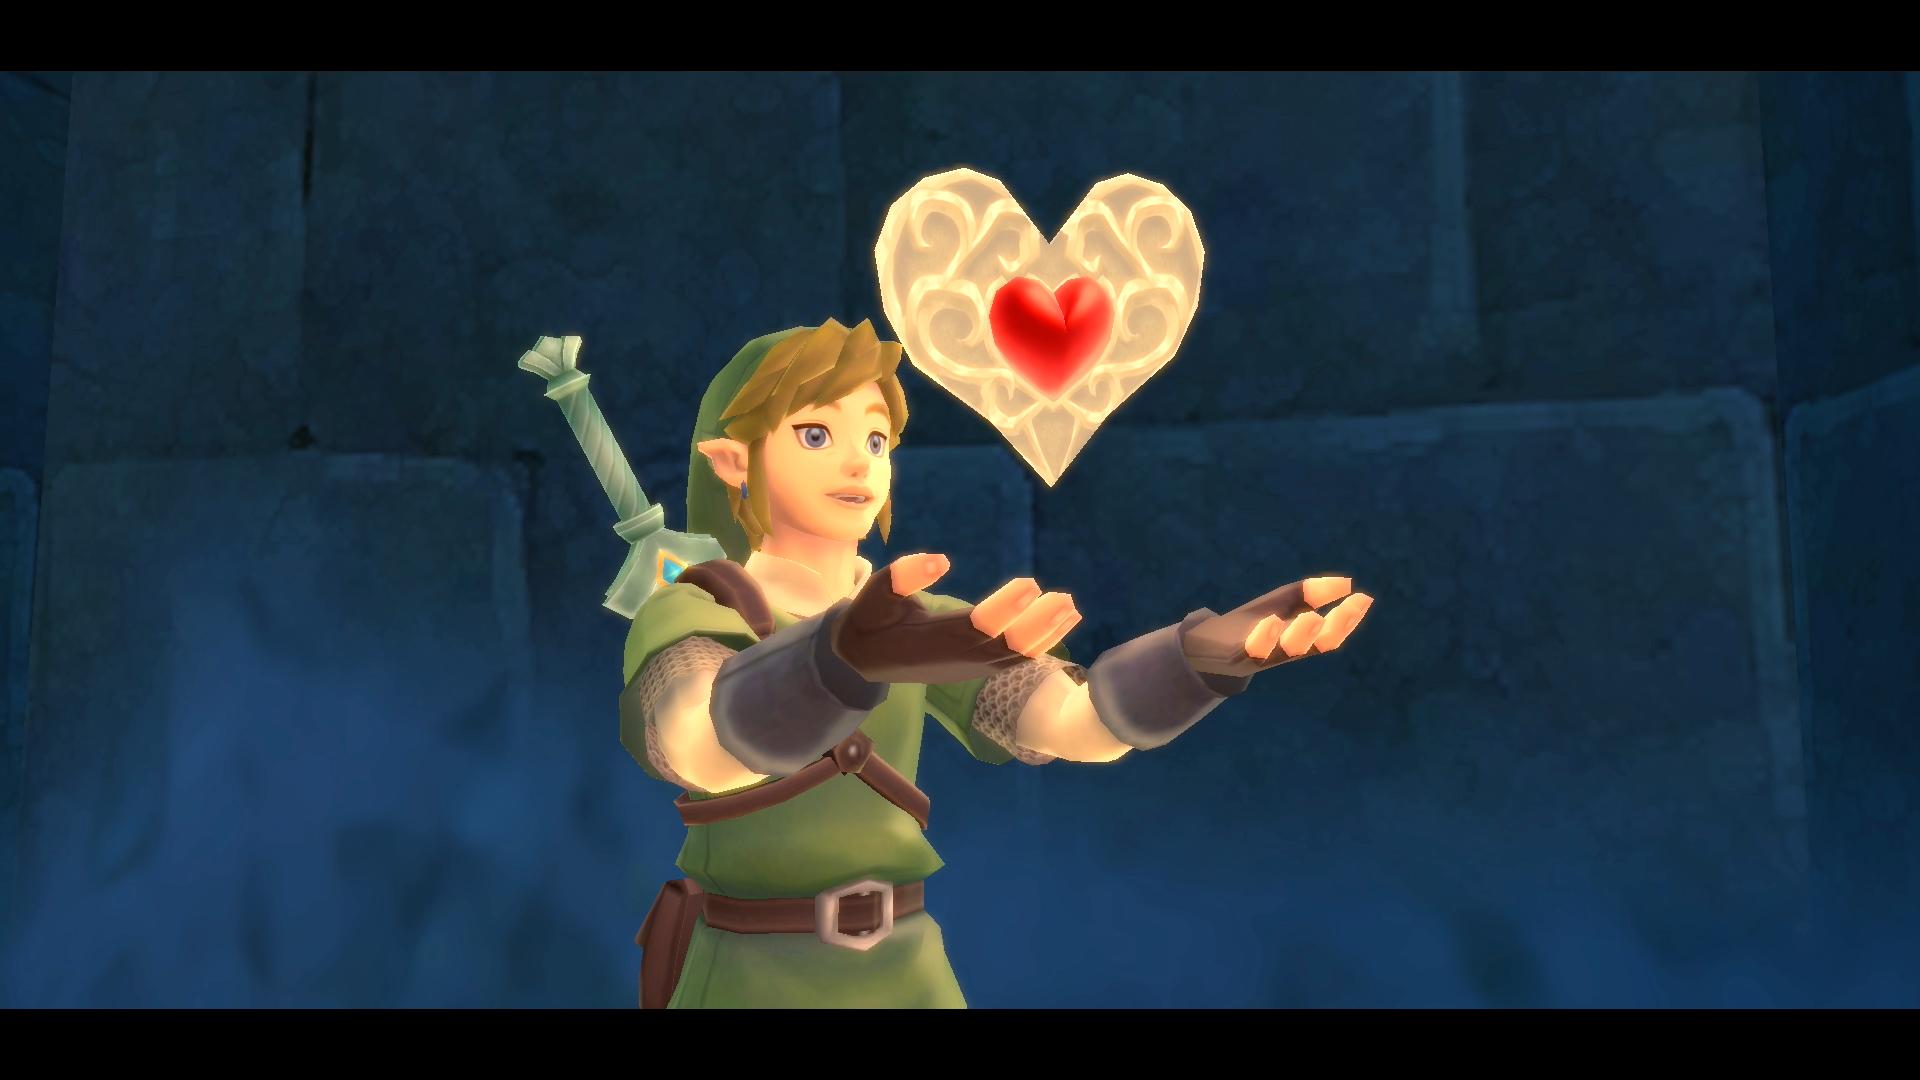 Link from The Legend of Zelda: Skyward Sword holding a heart